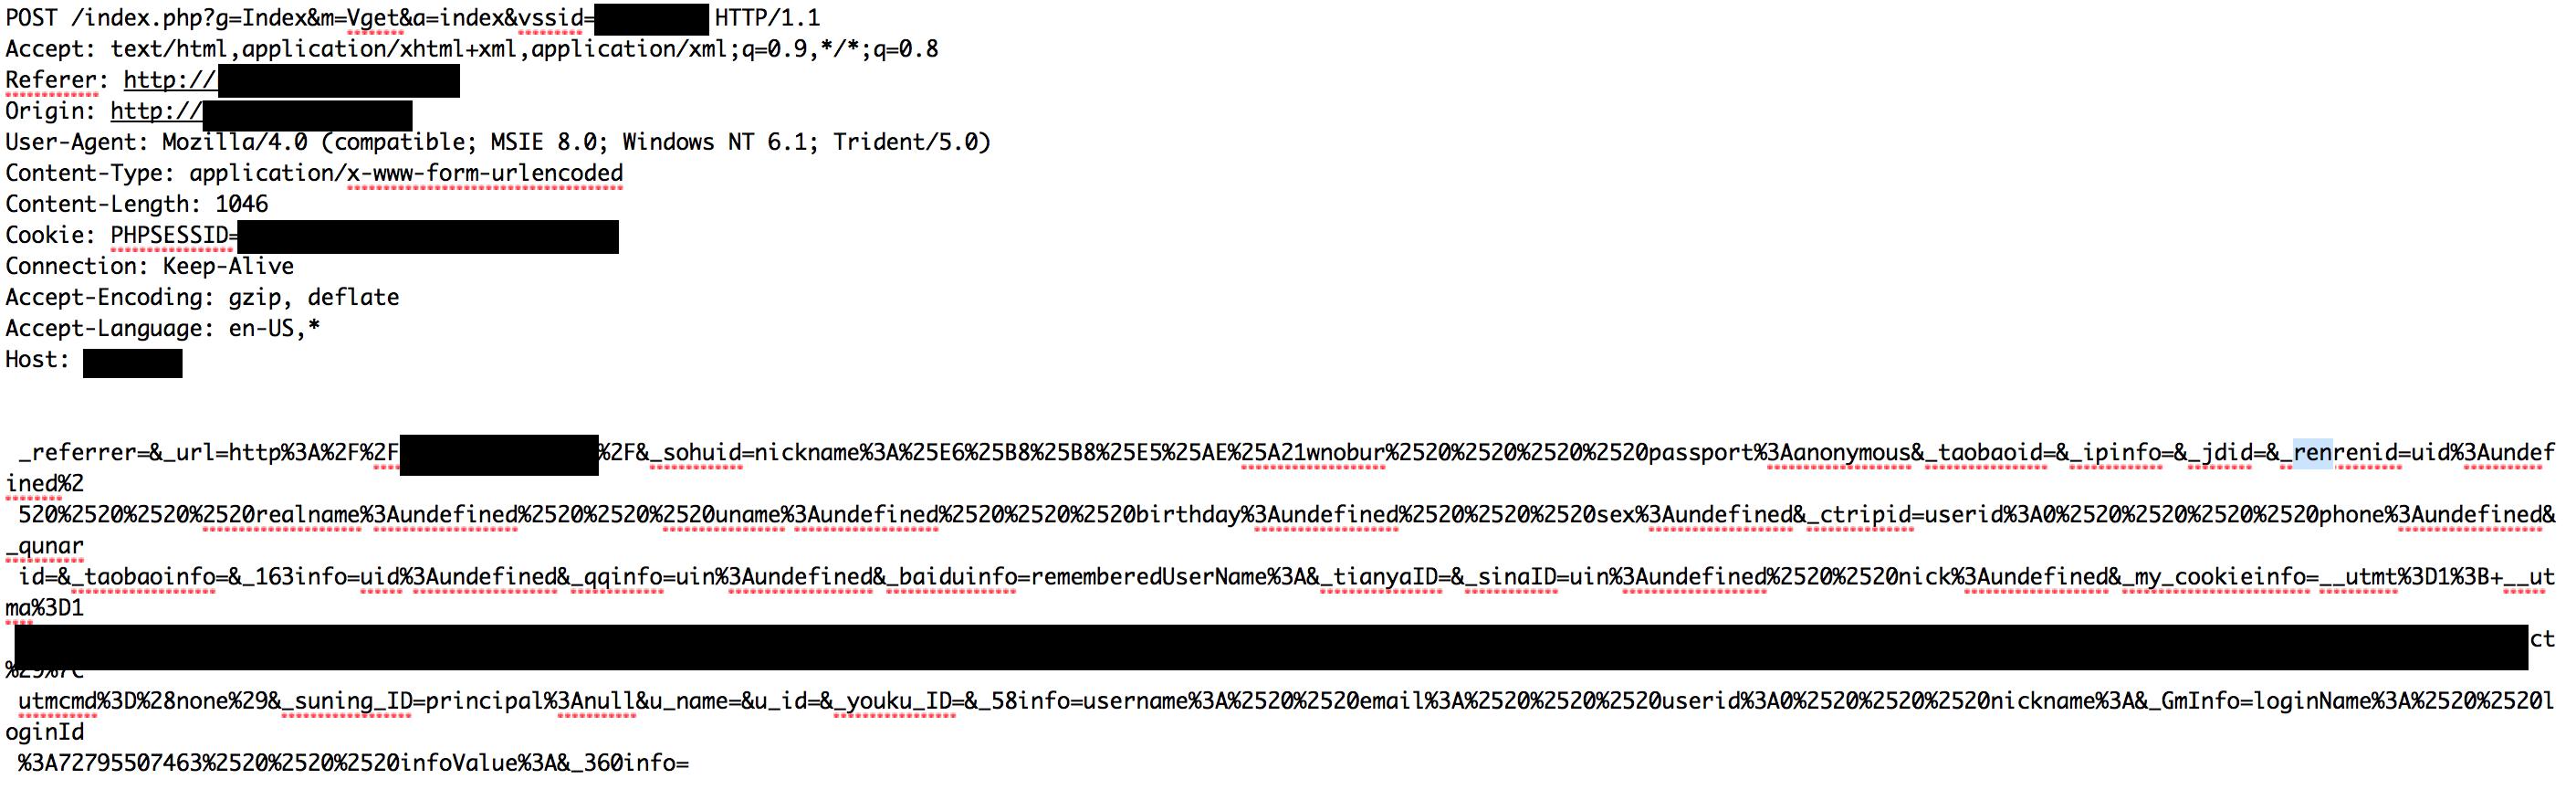 malicious javascript